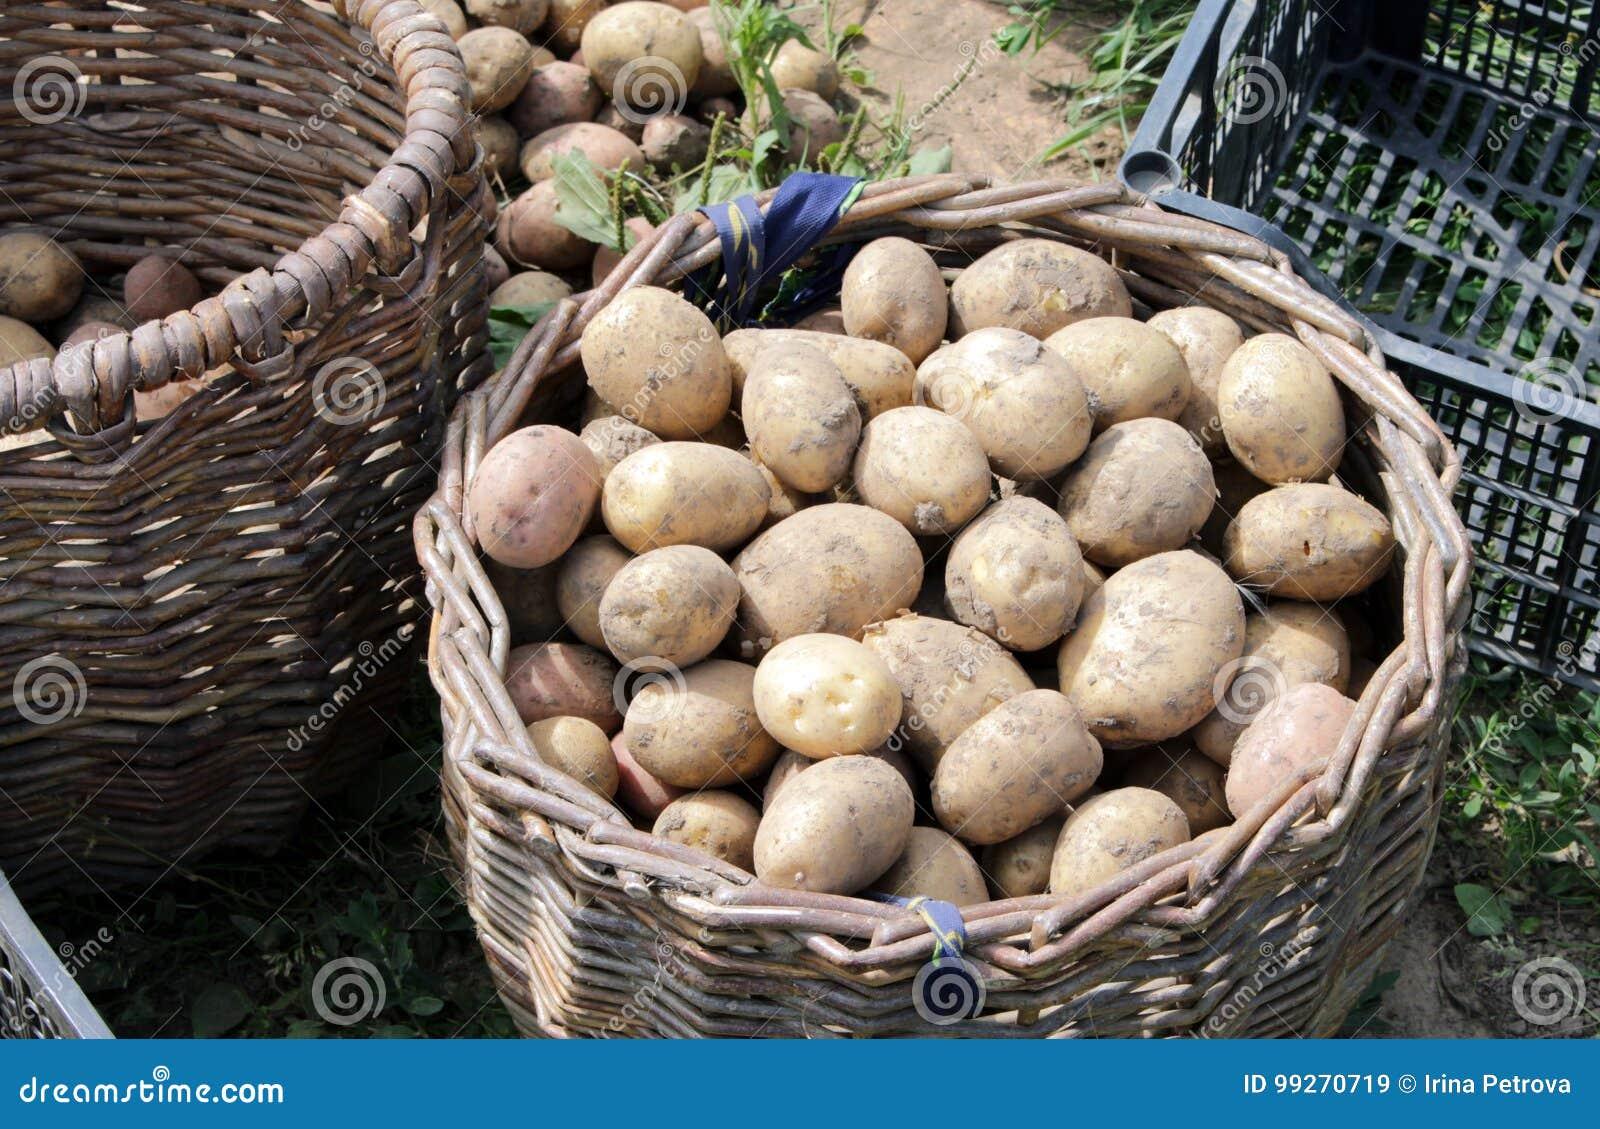 Freshly dug potatoes into a basket